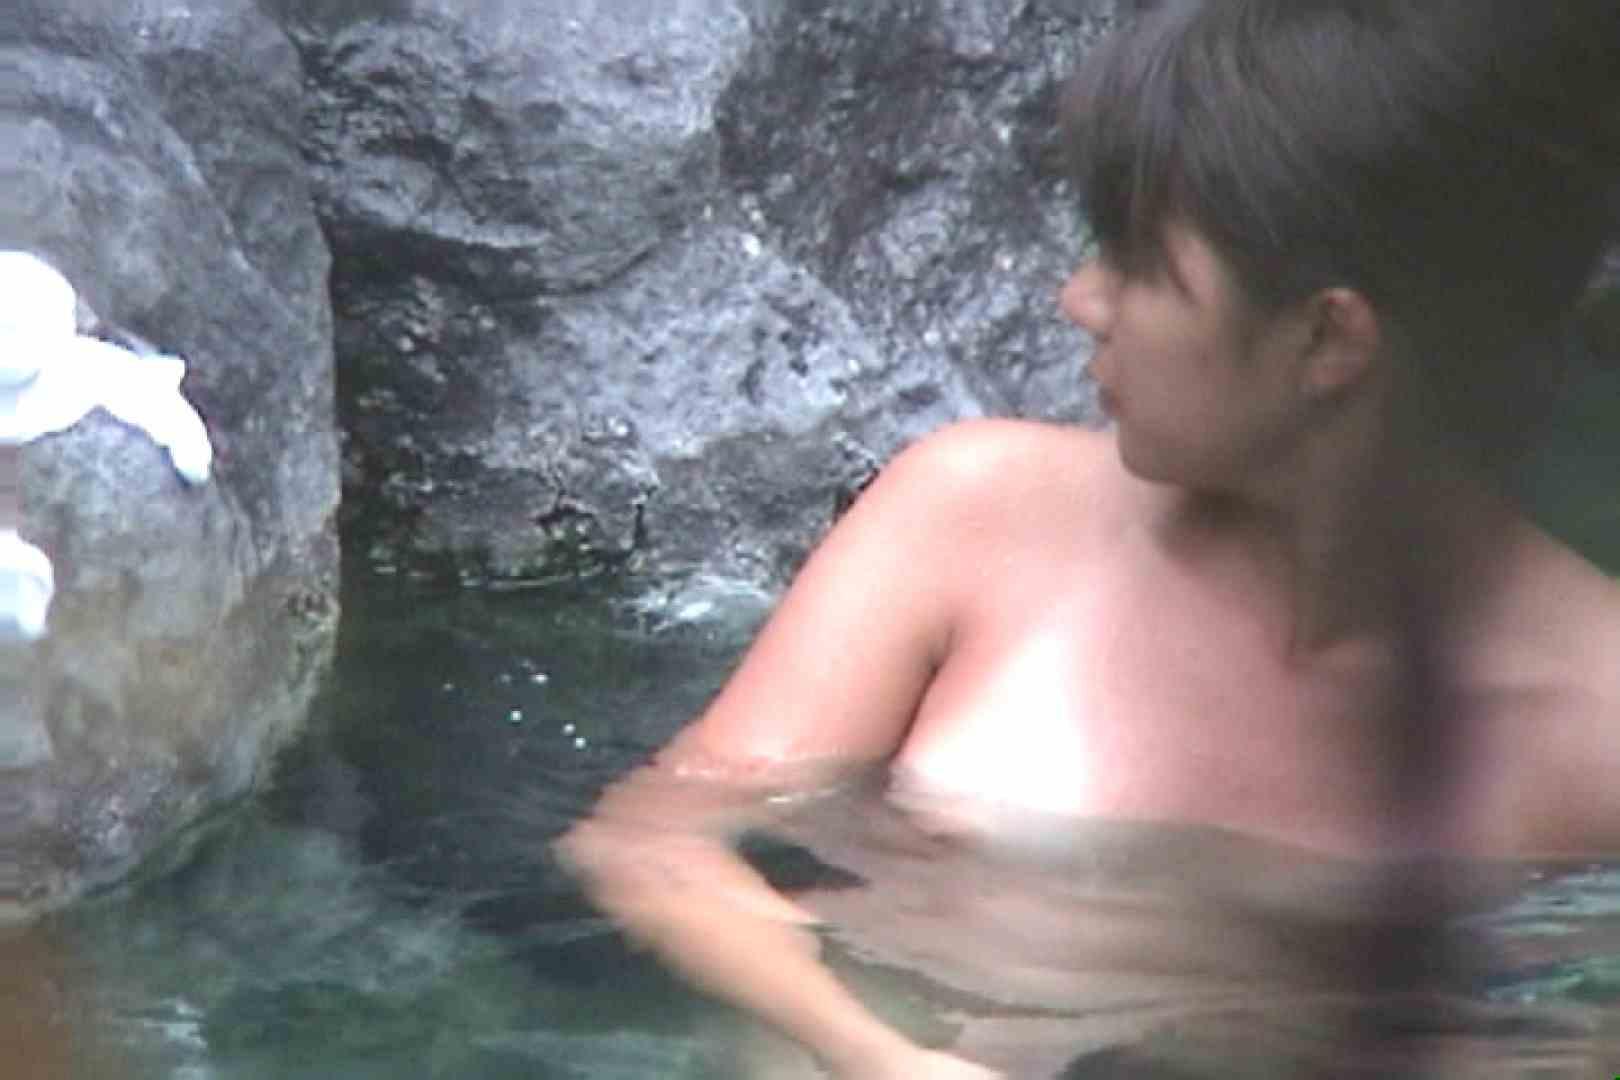 Aquaな露天風呂Vol.69【VIP限定】 盗撮 アダルト動画キャプチャ 106連発 80